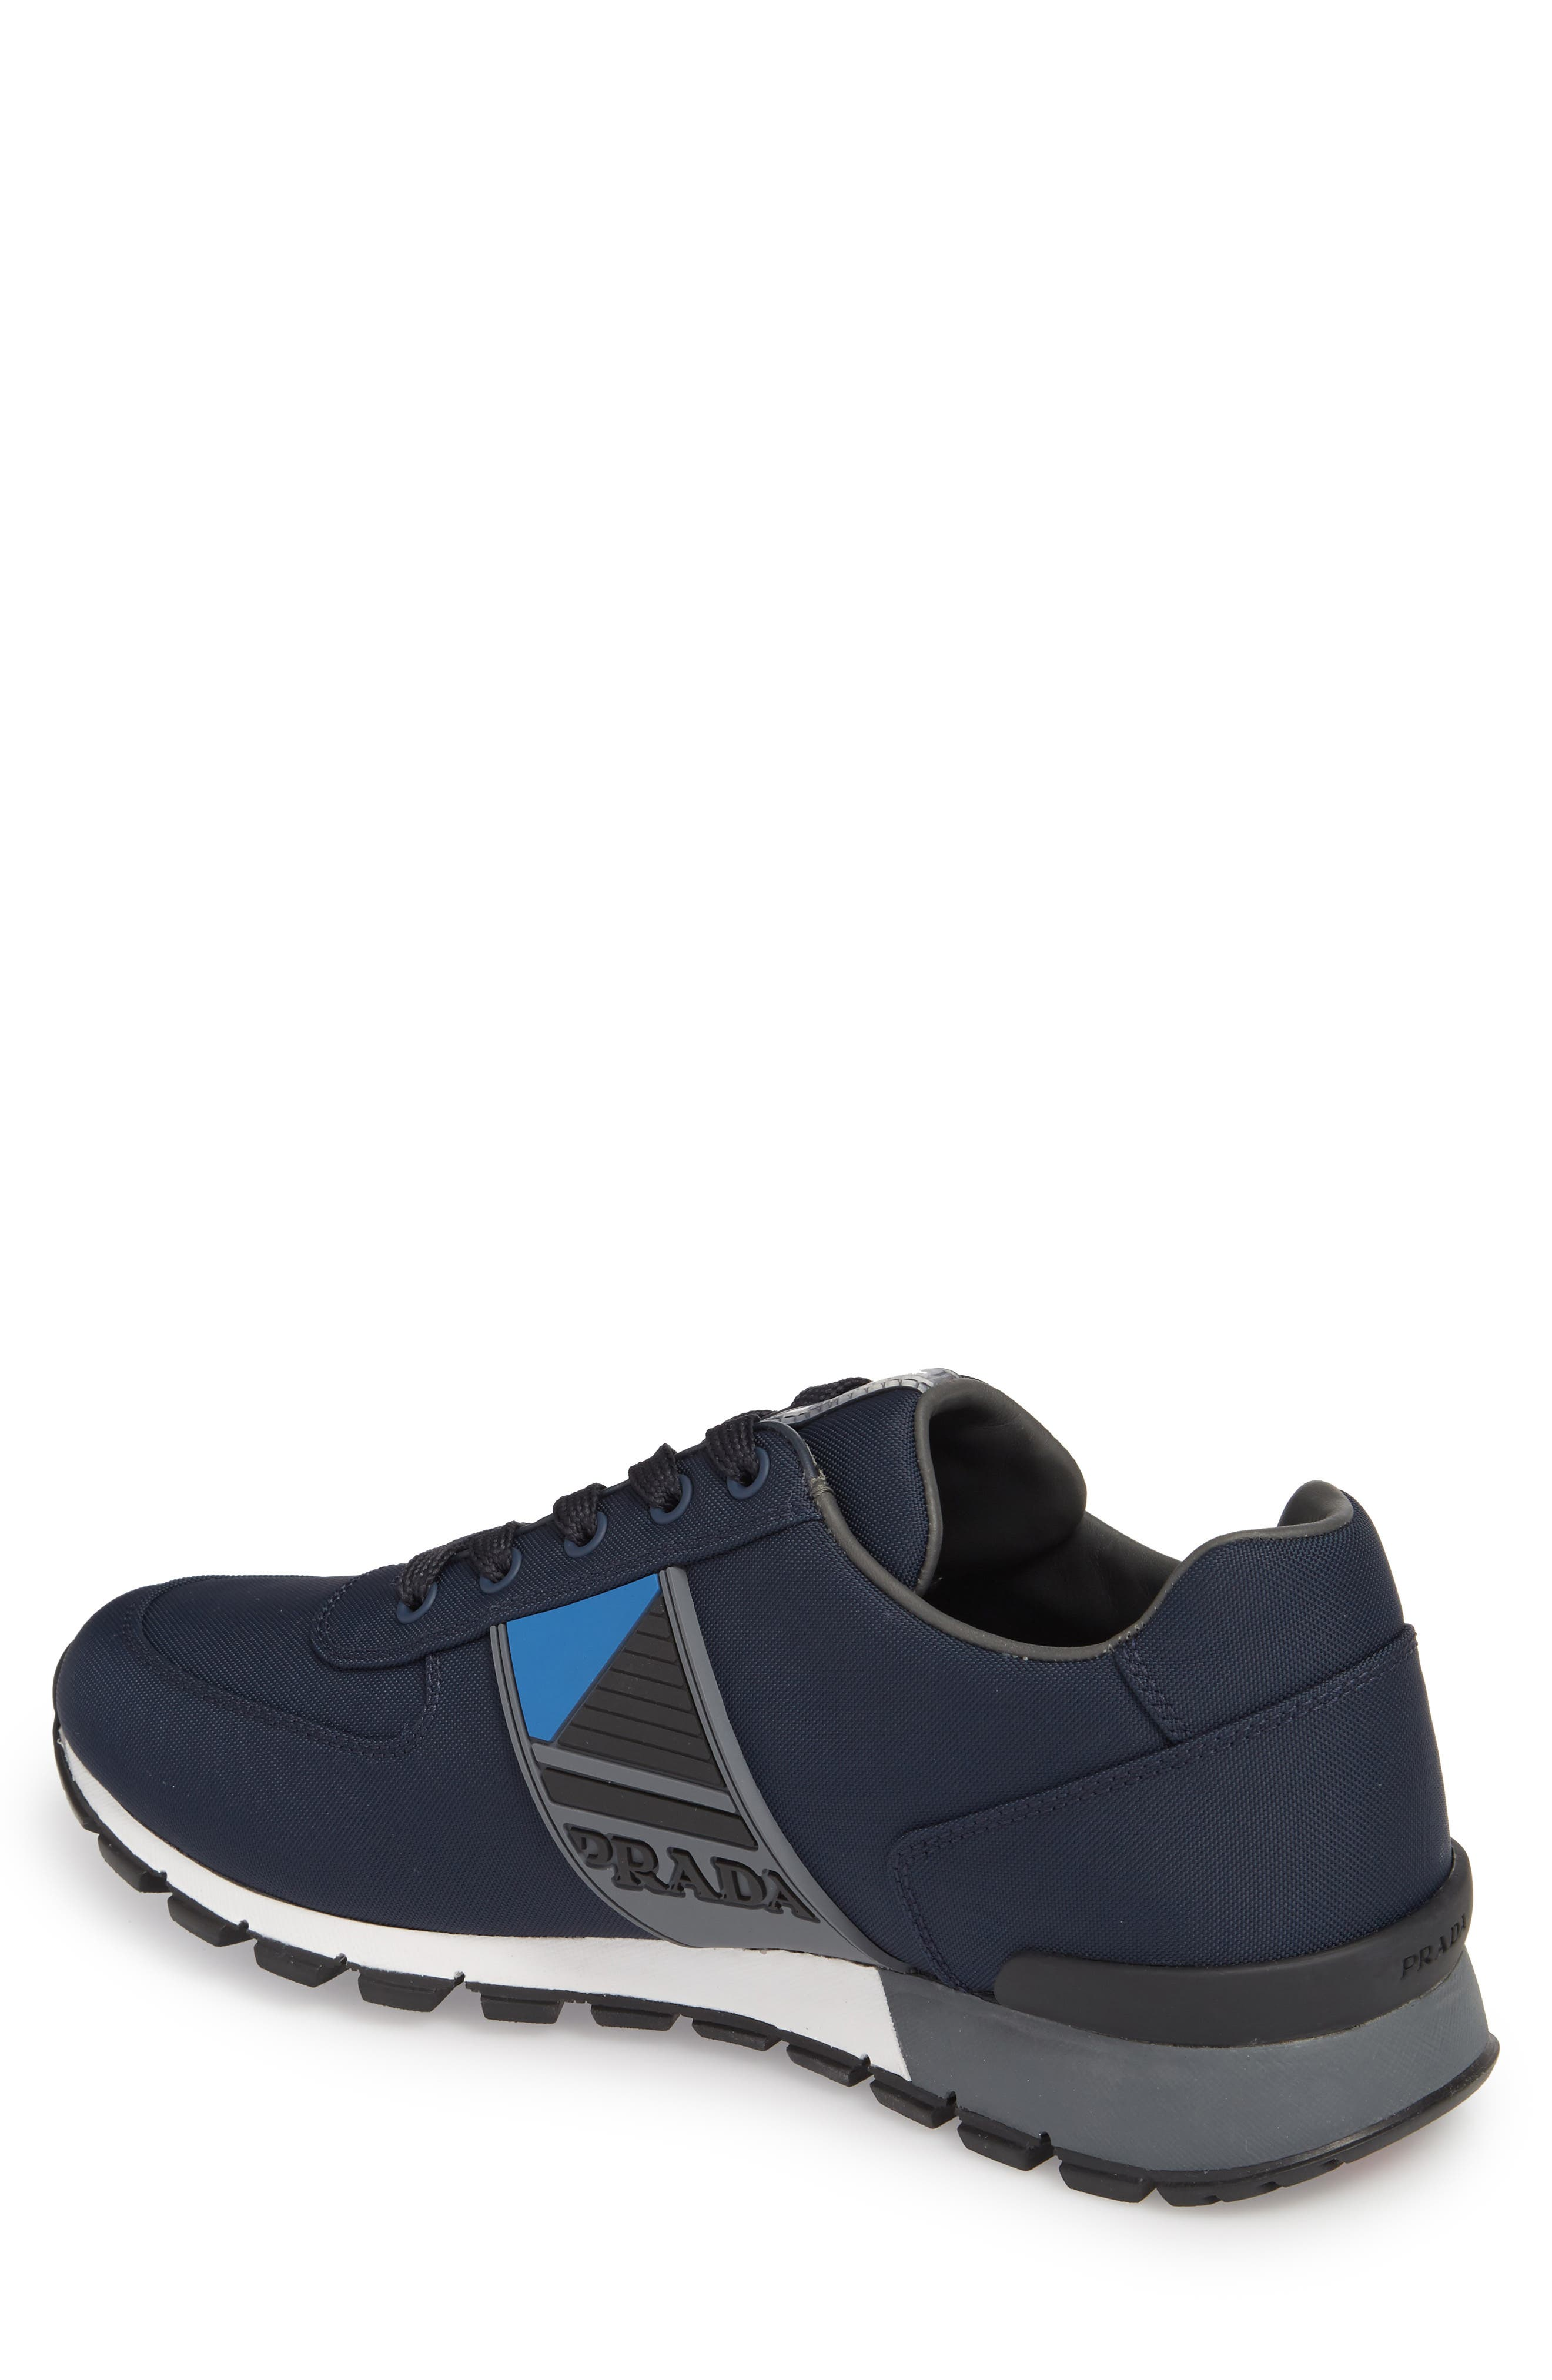 Alternate Image 2  - Prada Linea Rossa Sneaker (Men)